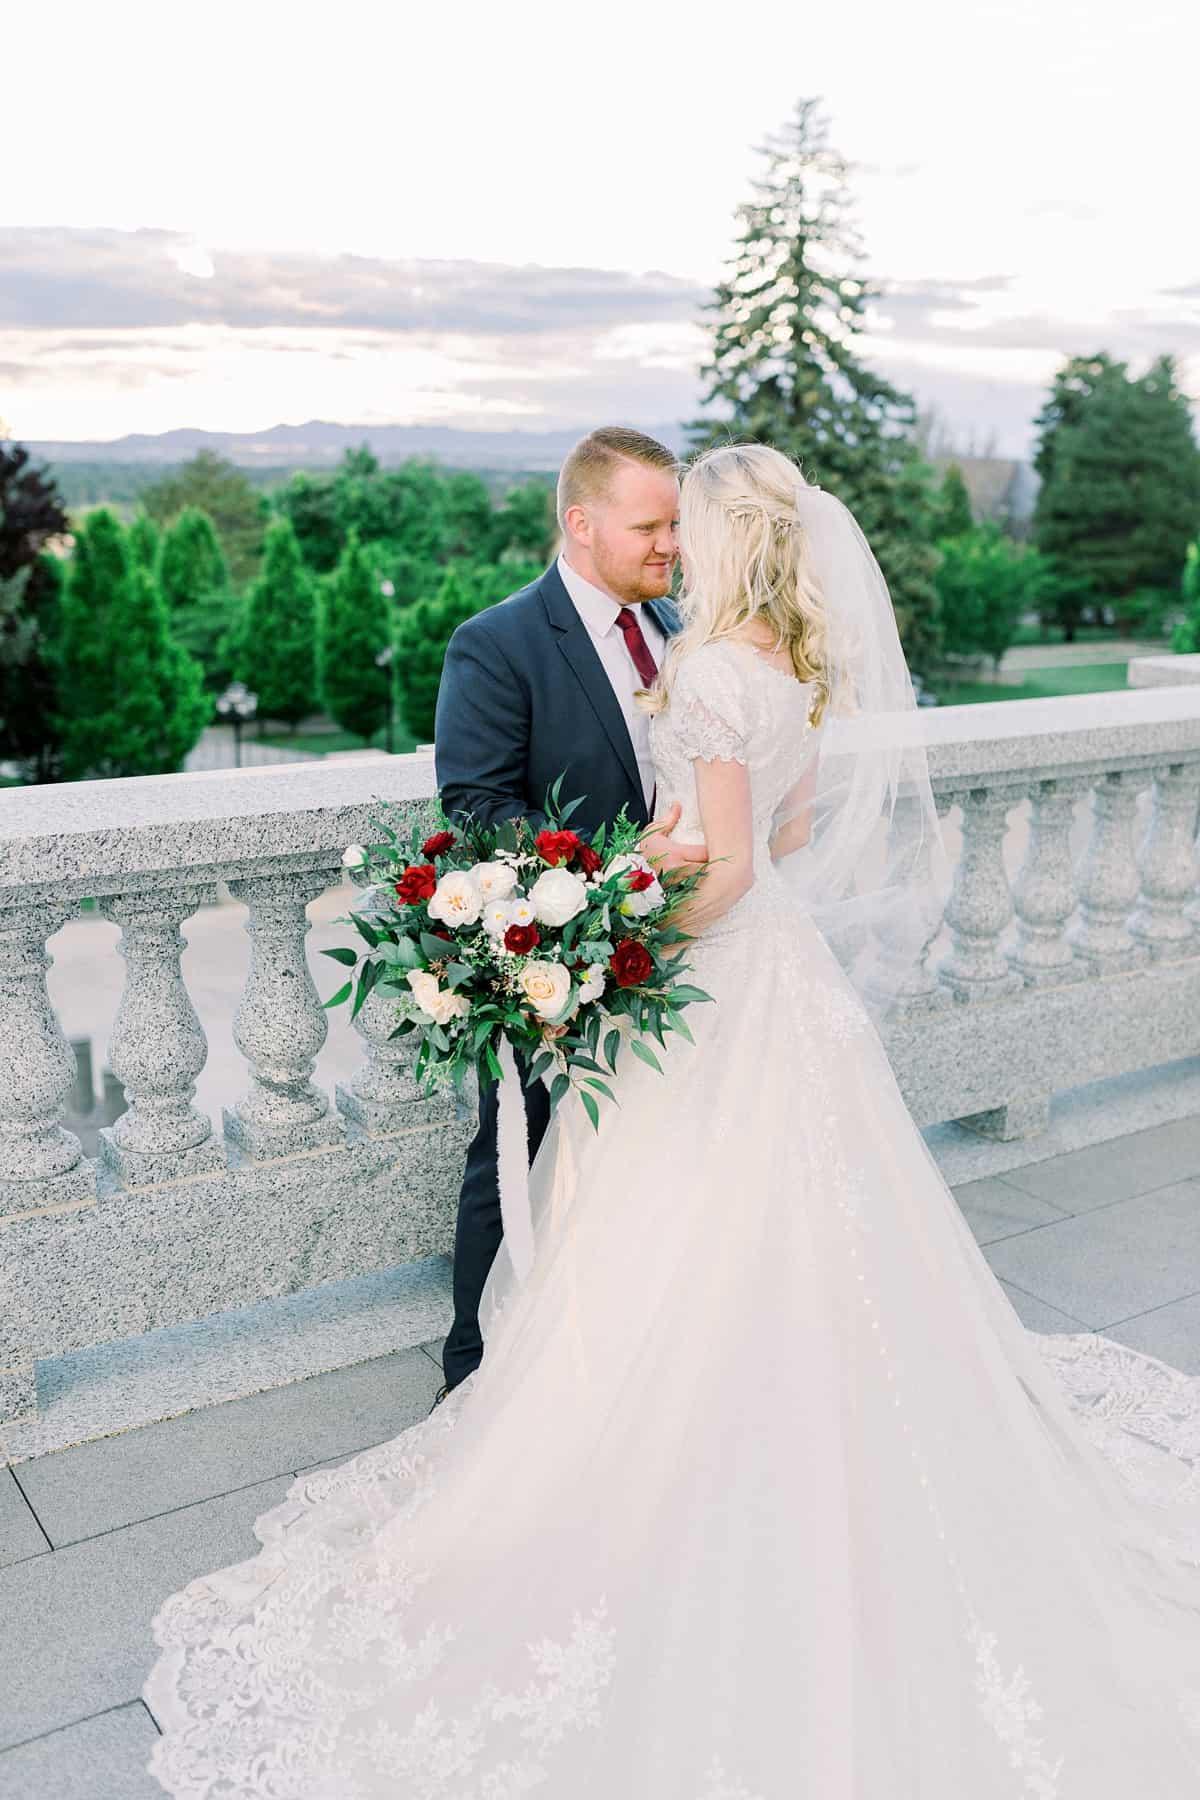 Bride and groom spring wedding, film wedding photography